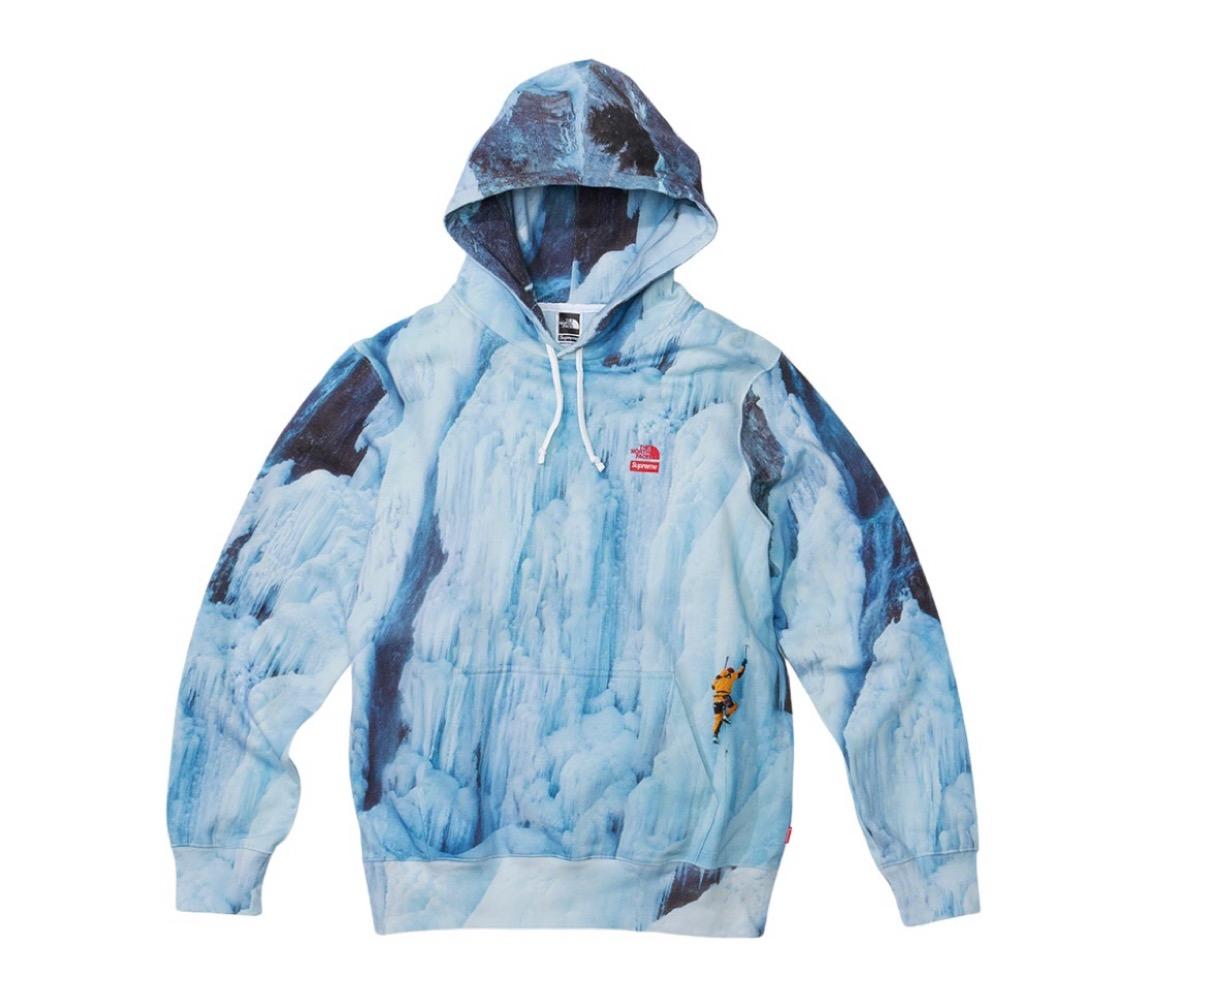 supreme 2021ss シュプリーム 2021春夏 week5 ノースフェイス Supreme®/The North Face® Ice Climb Hooded Sweatshirt